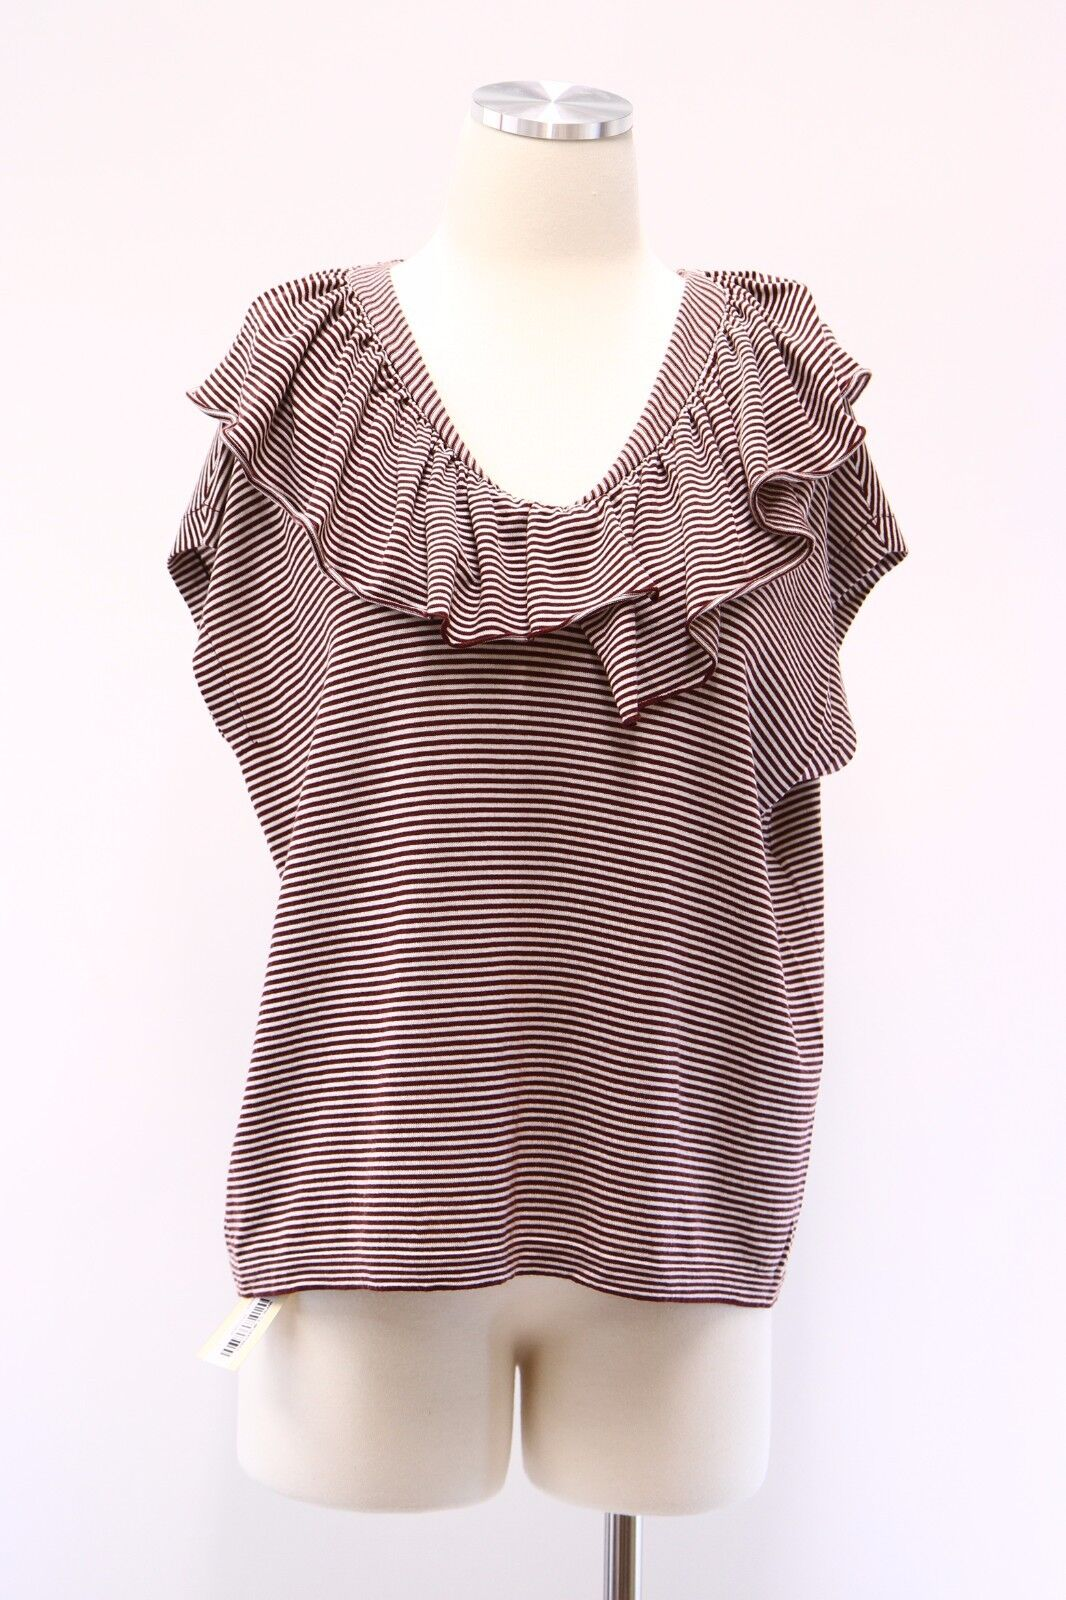 NWT 1645 Brunello Cucinelli Cashmere-Wool Striped Striped Striped Ruffled Collar Knit Top M A176 65e893